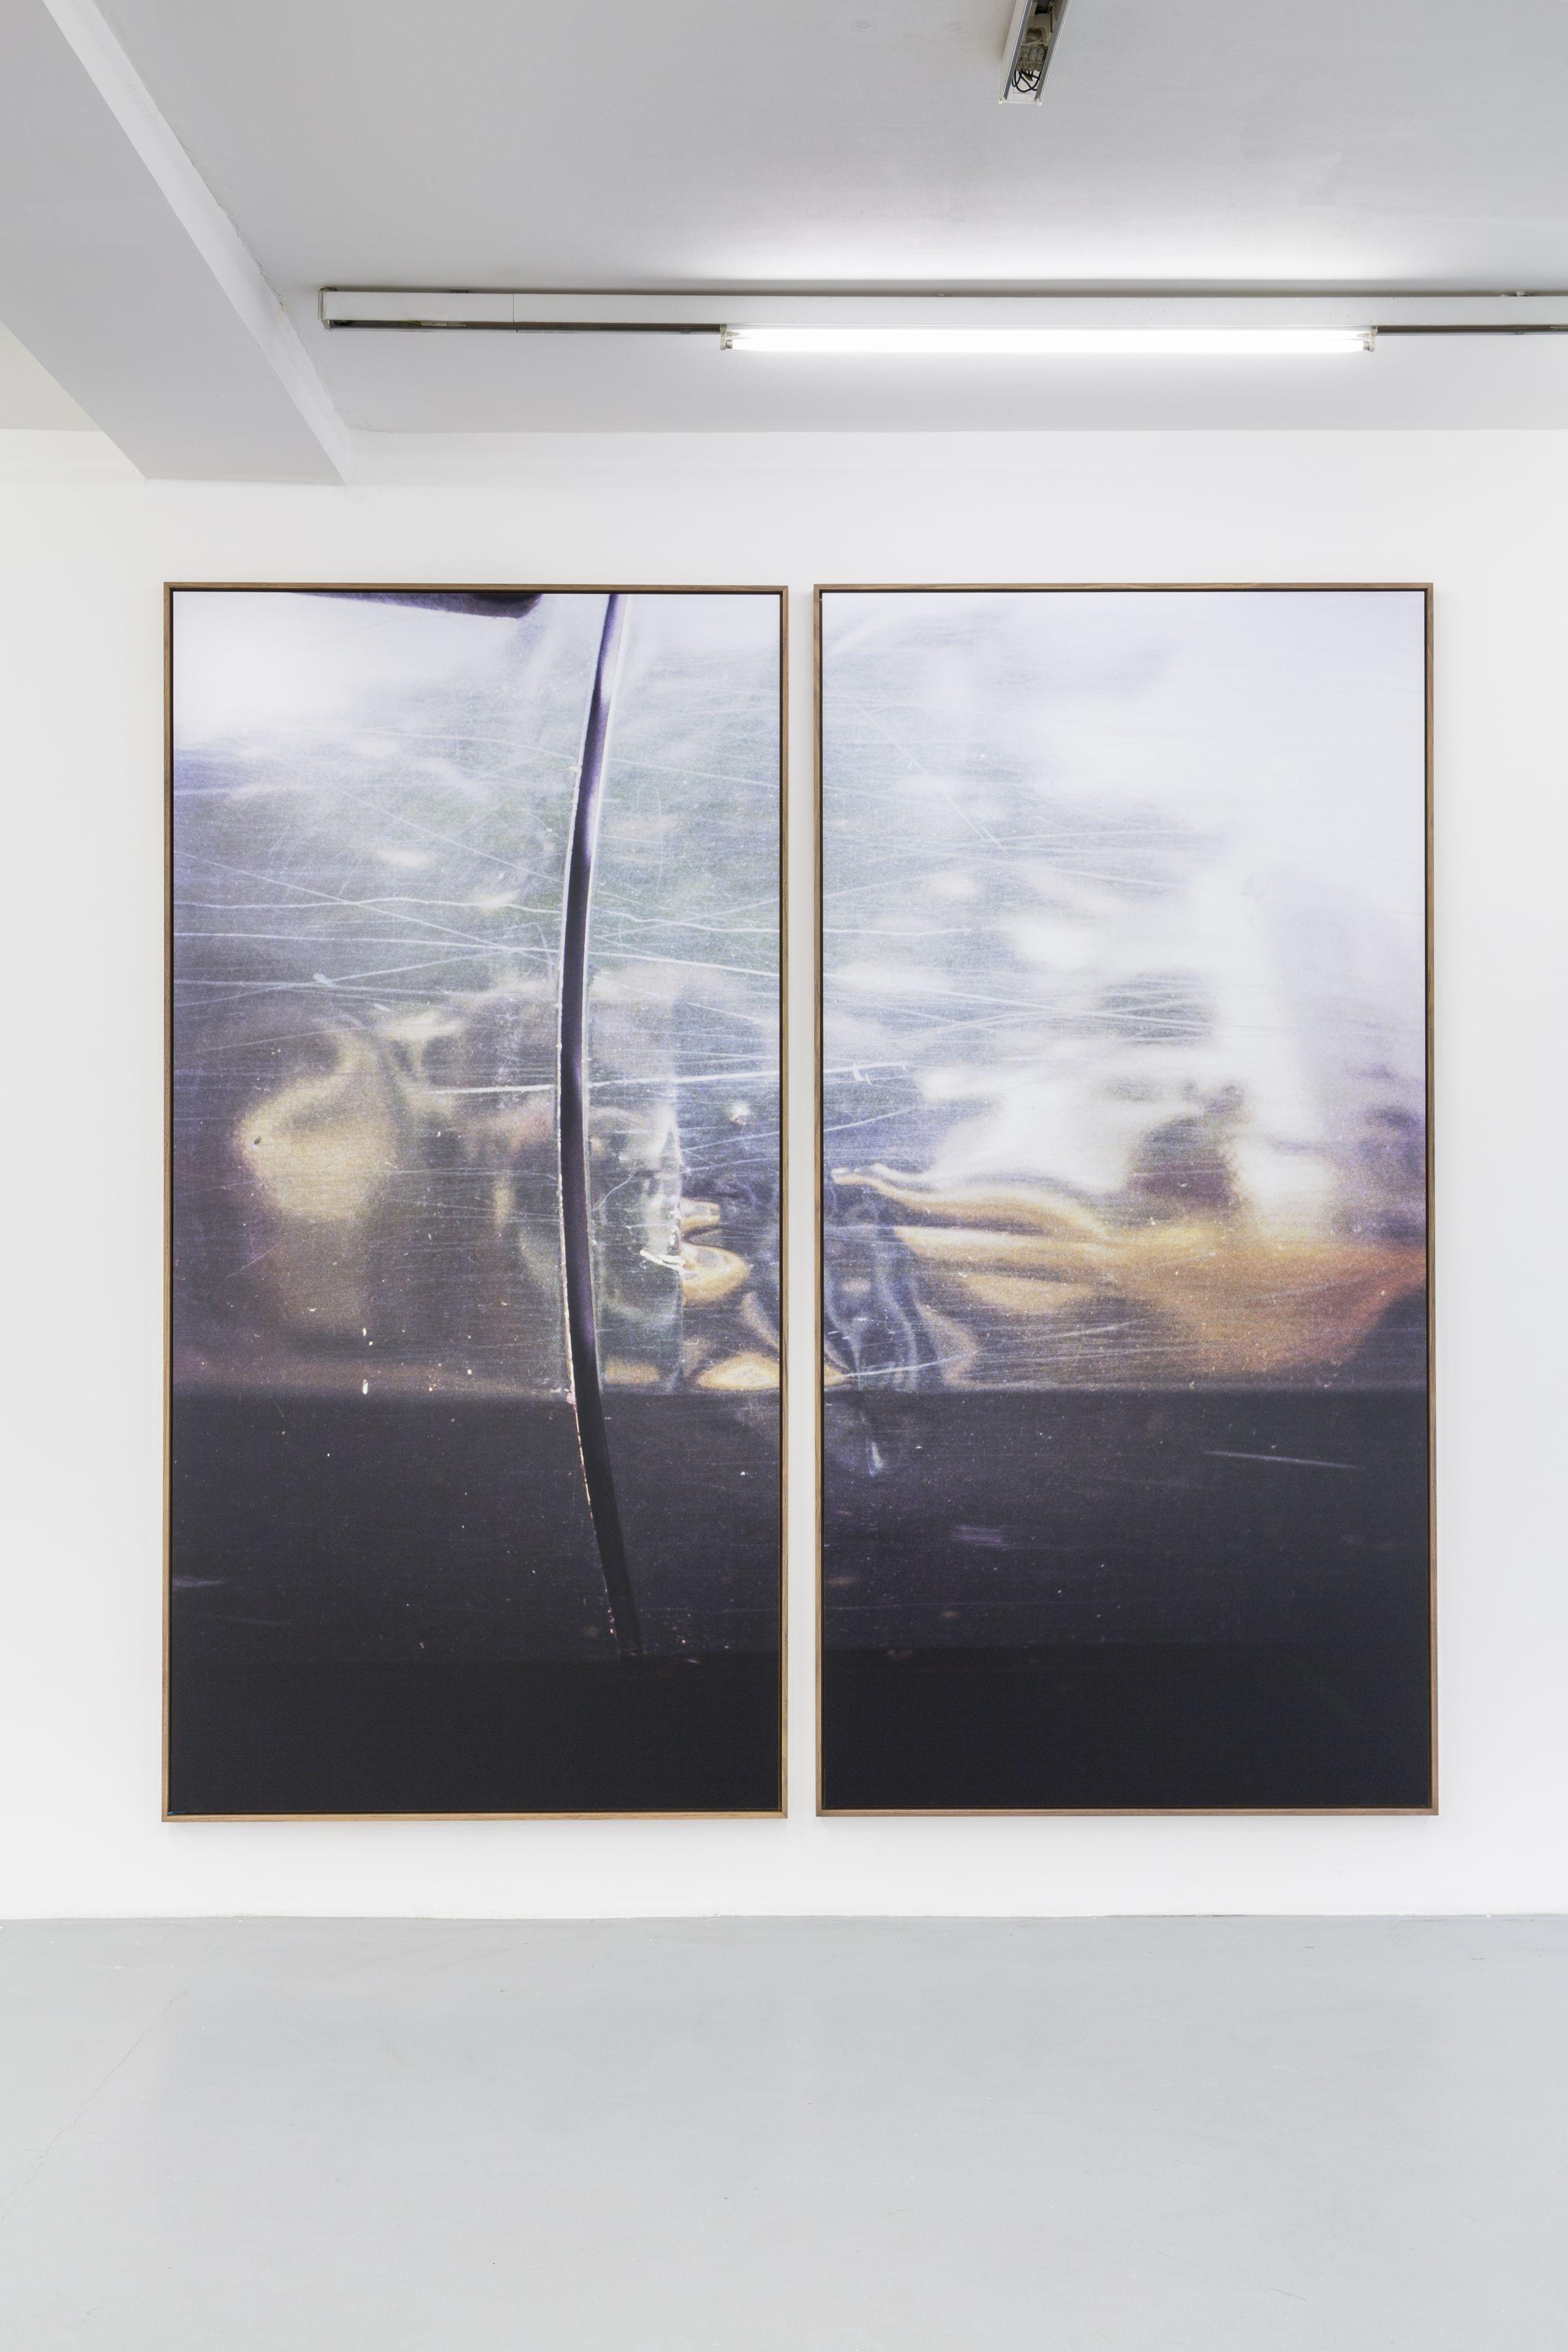 Jan Dibbets: New Colorstudies 1976/2012 – installation view 4